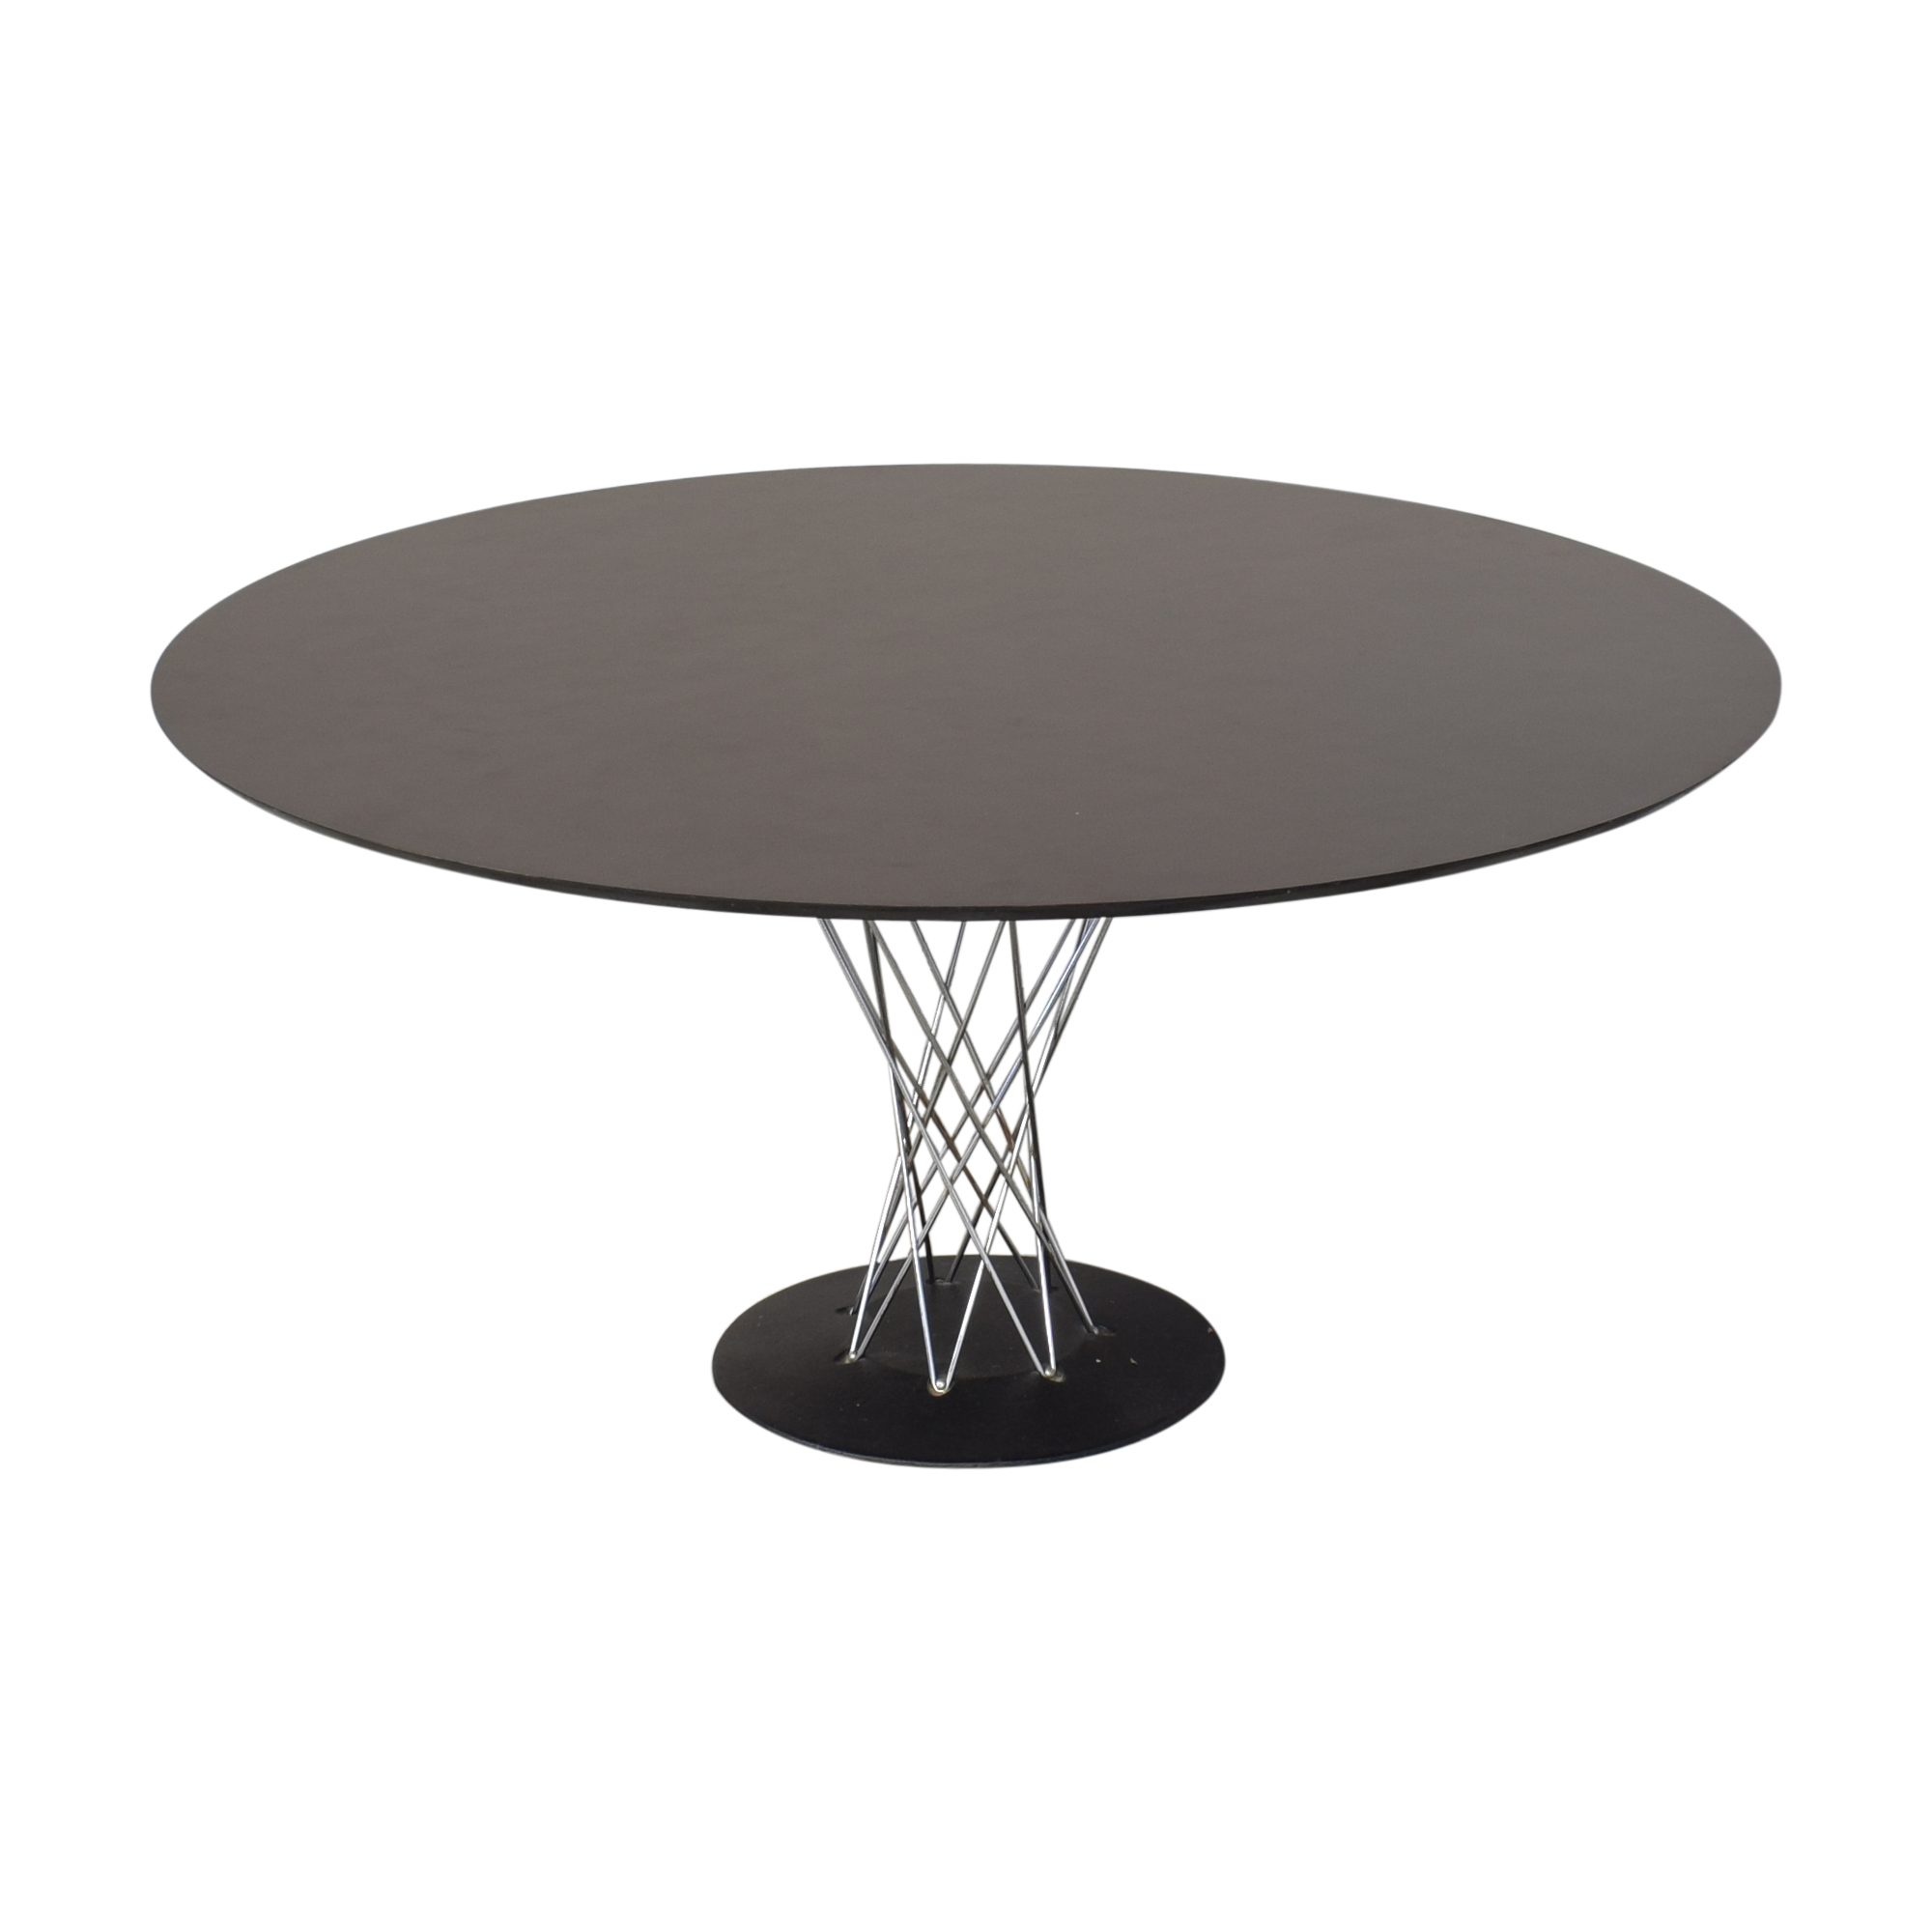 Modernica Modernica Cyclone Dining Table by Isamu Noguchi price